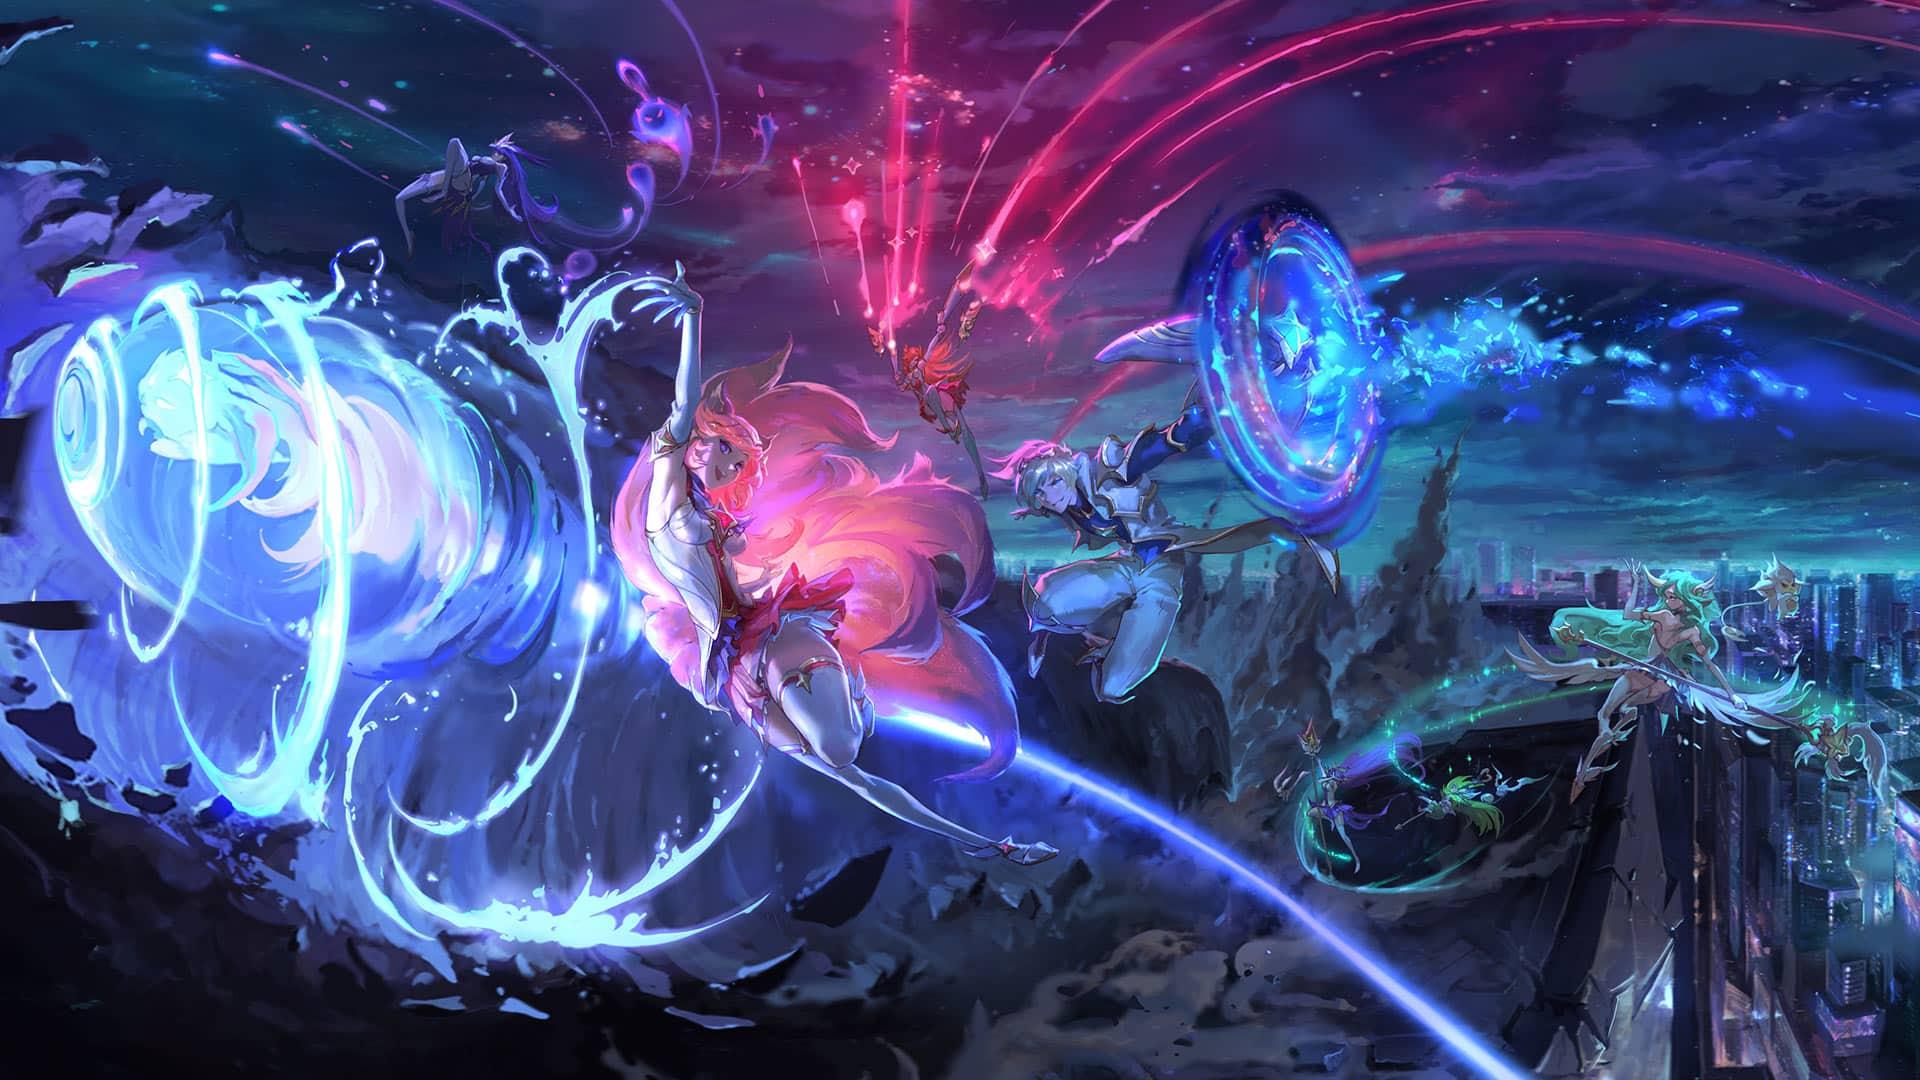 teamfight-tactics-set-3-star-guardian-galaxie-gardien-des-etoiles